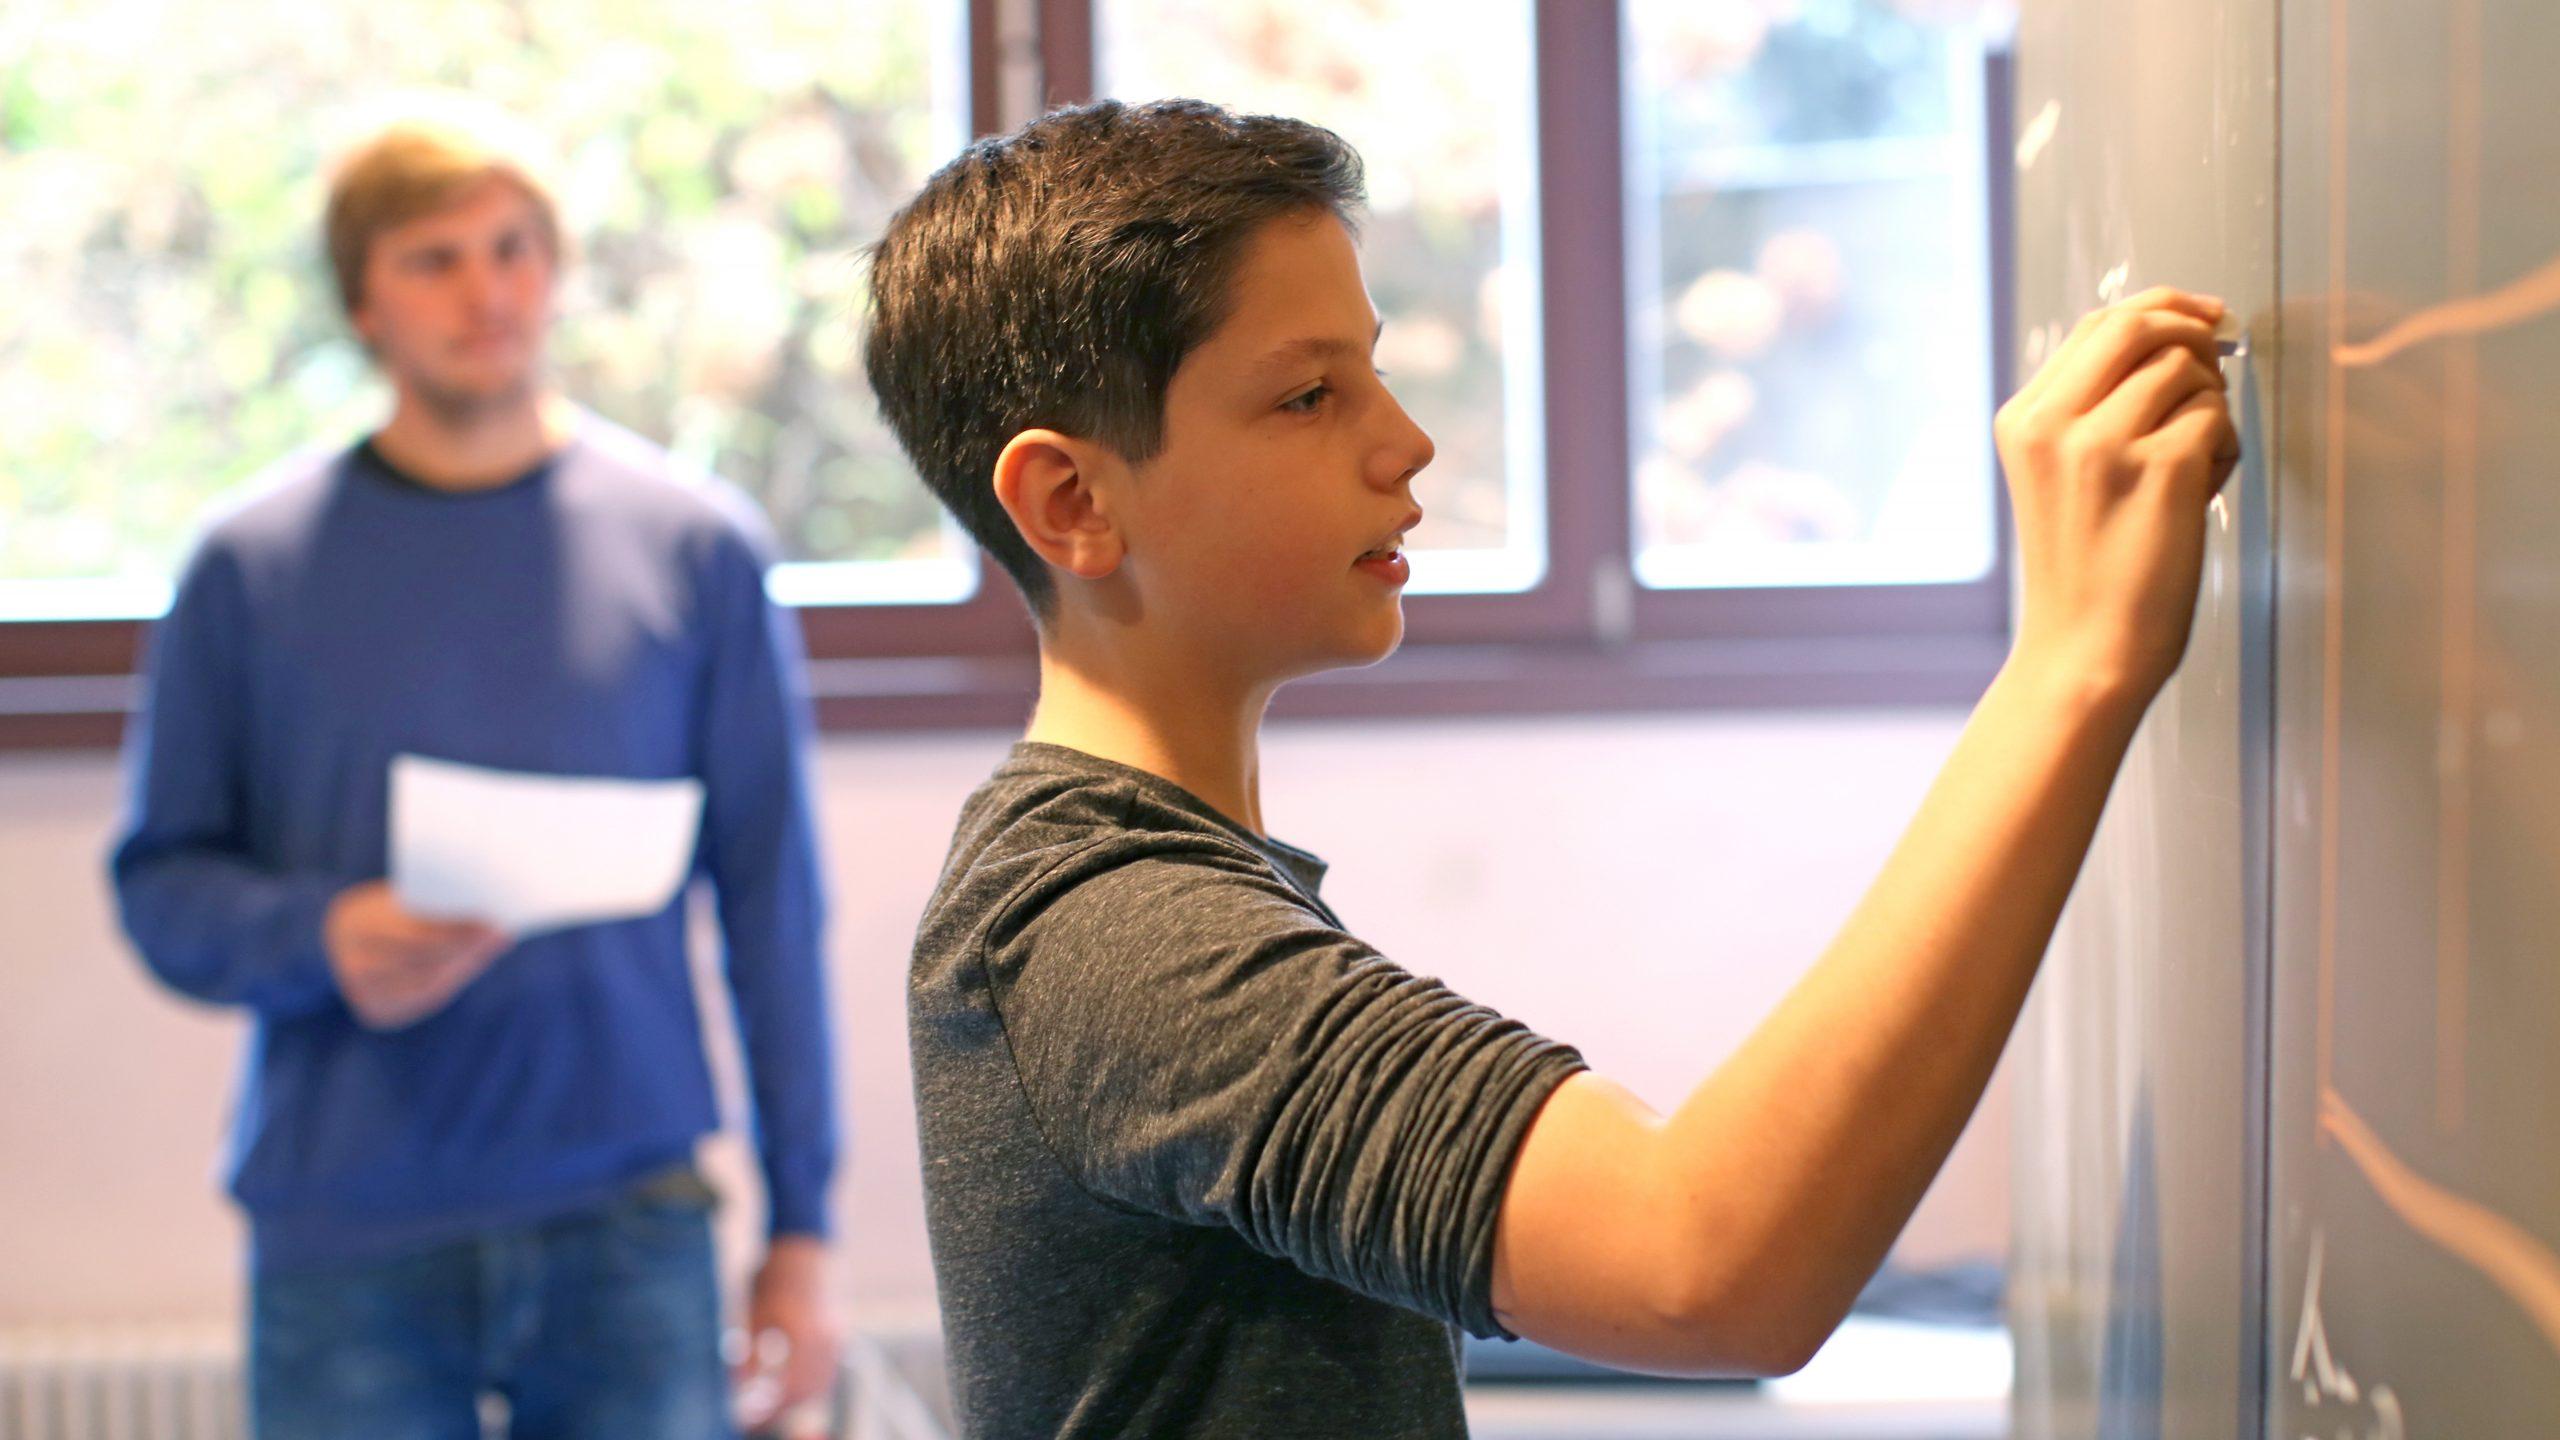 Sonderpädagogik, Inklusive Pädagogik Studieren In ganzes Sonderpädagogik Fachhochschule